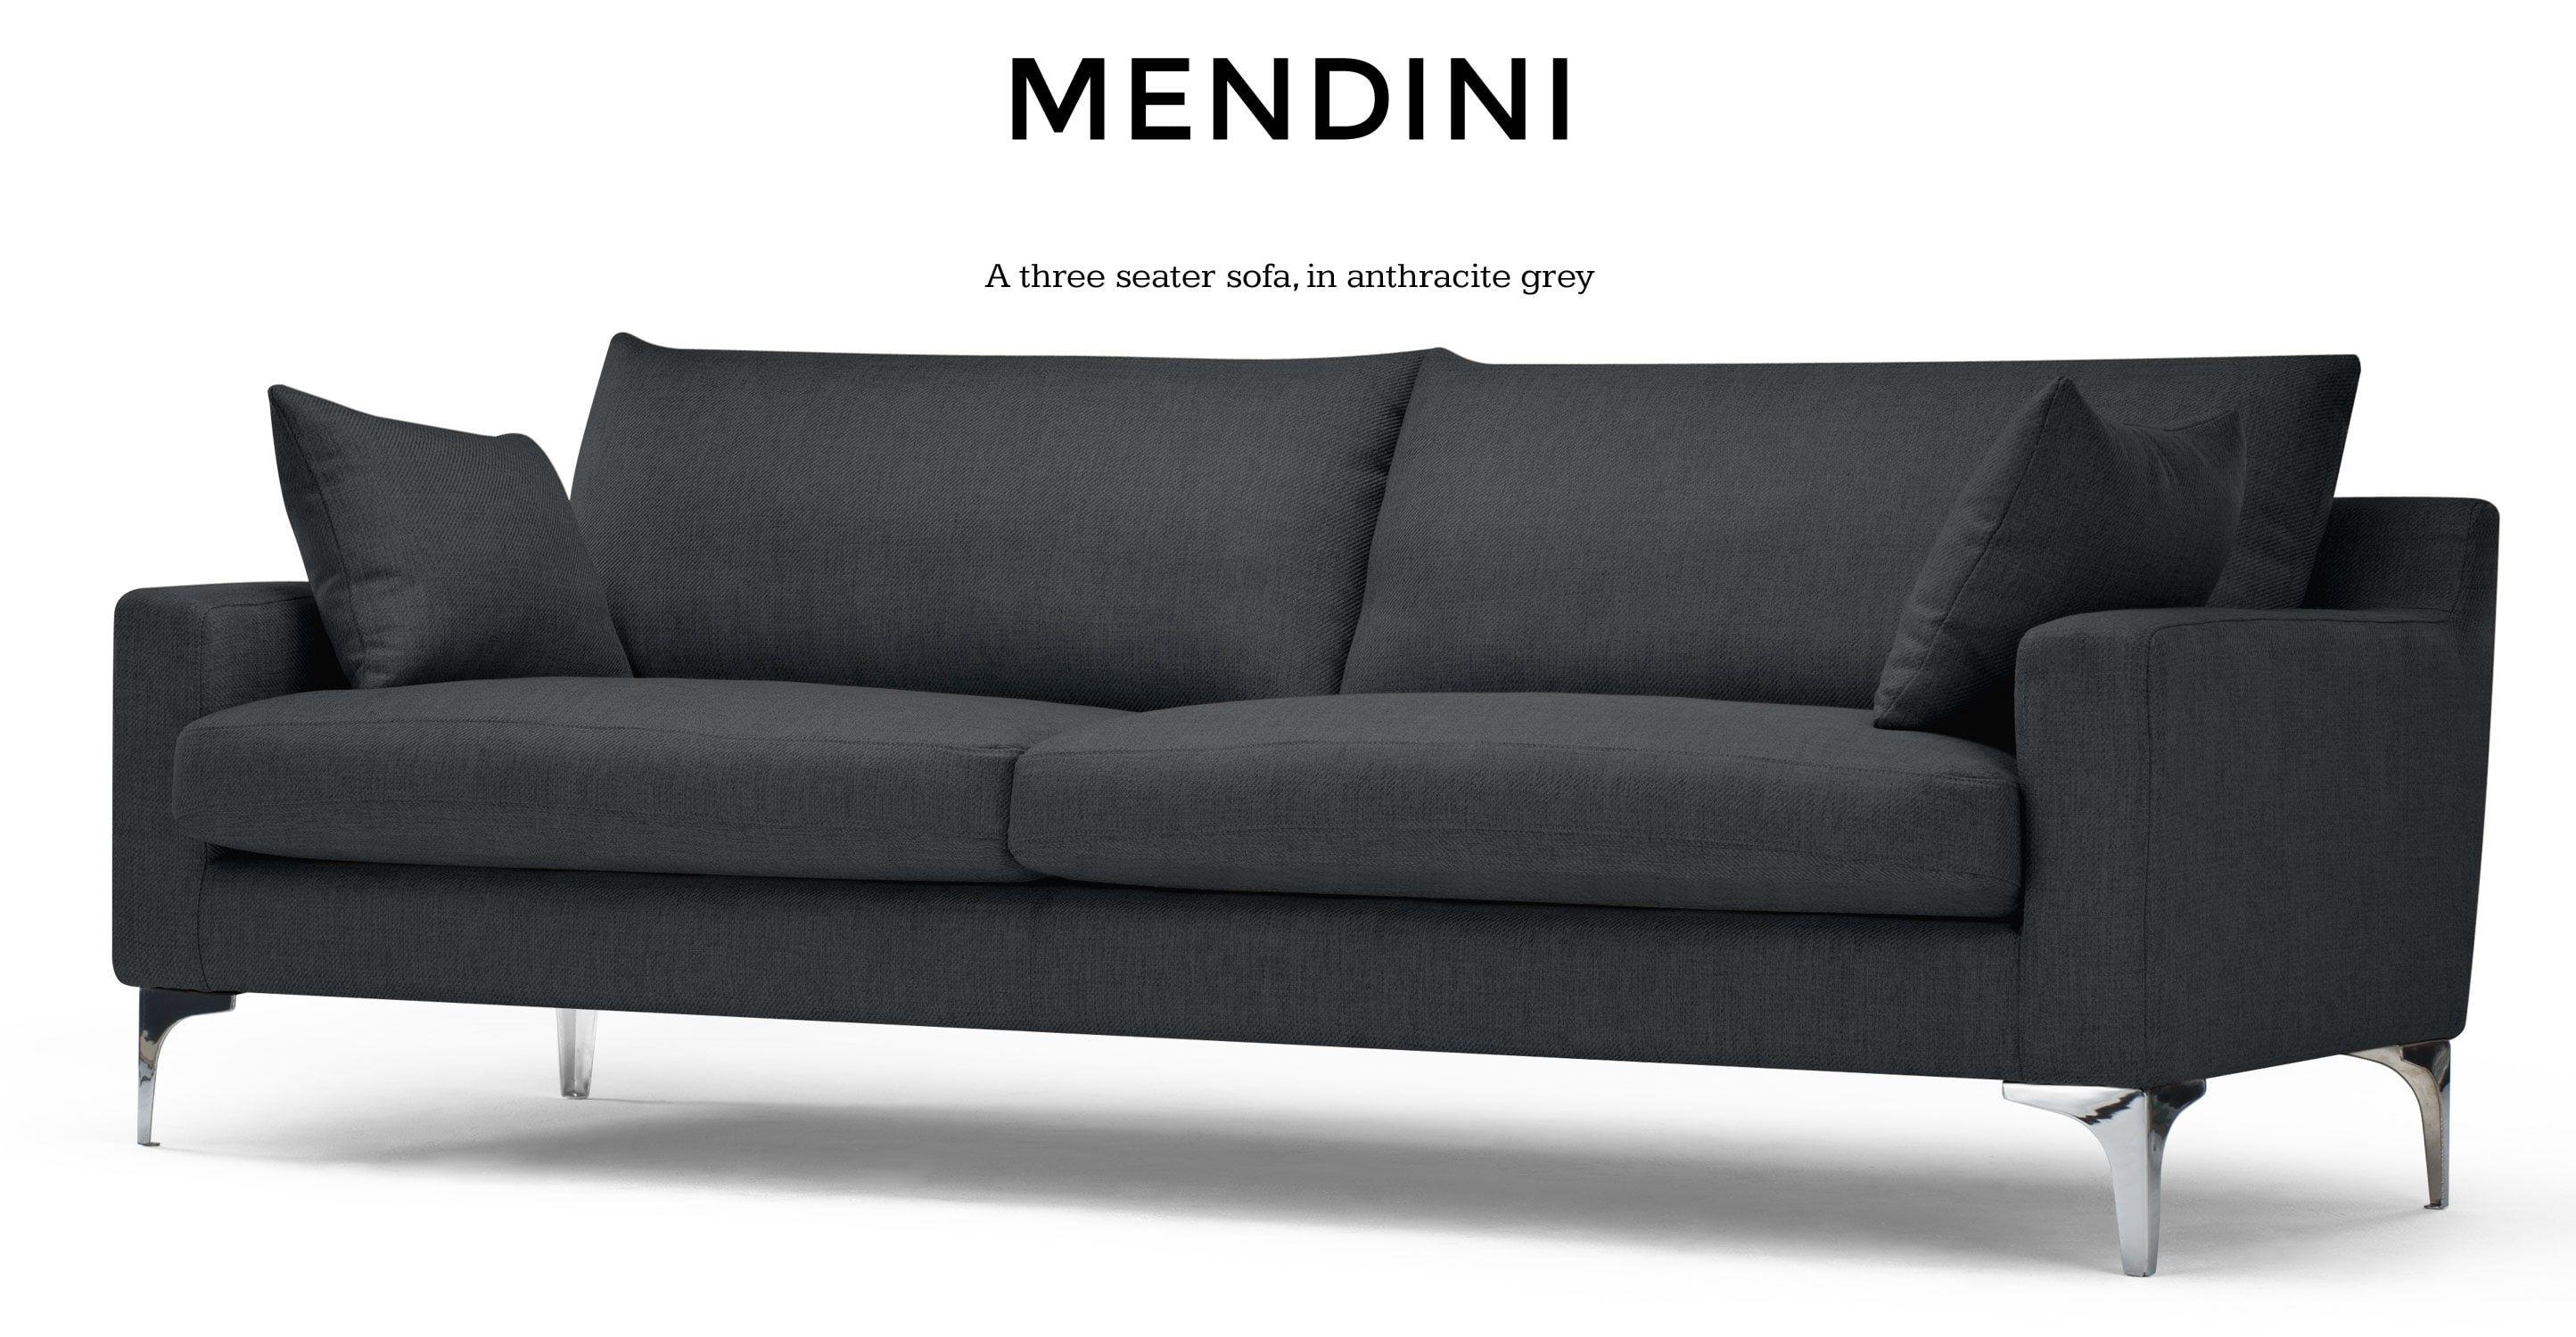 Mendini 3 Seater Sofa Anthracite Grey Sofa 3 Seater Sofa Three Seater Sofa